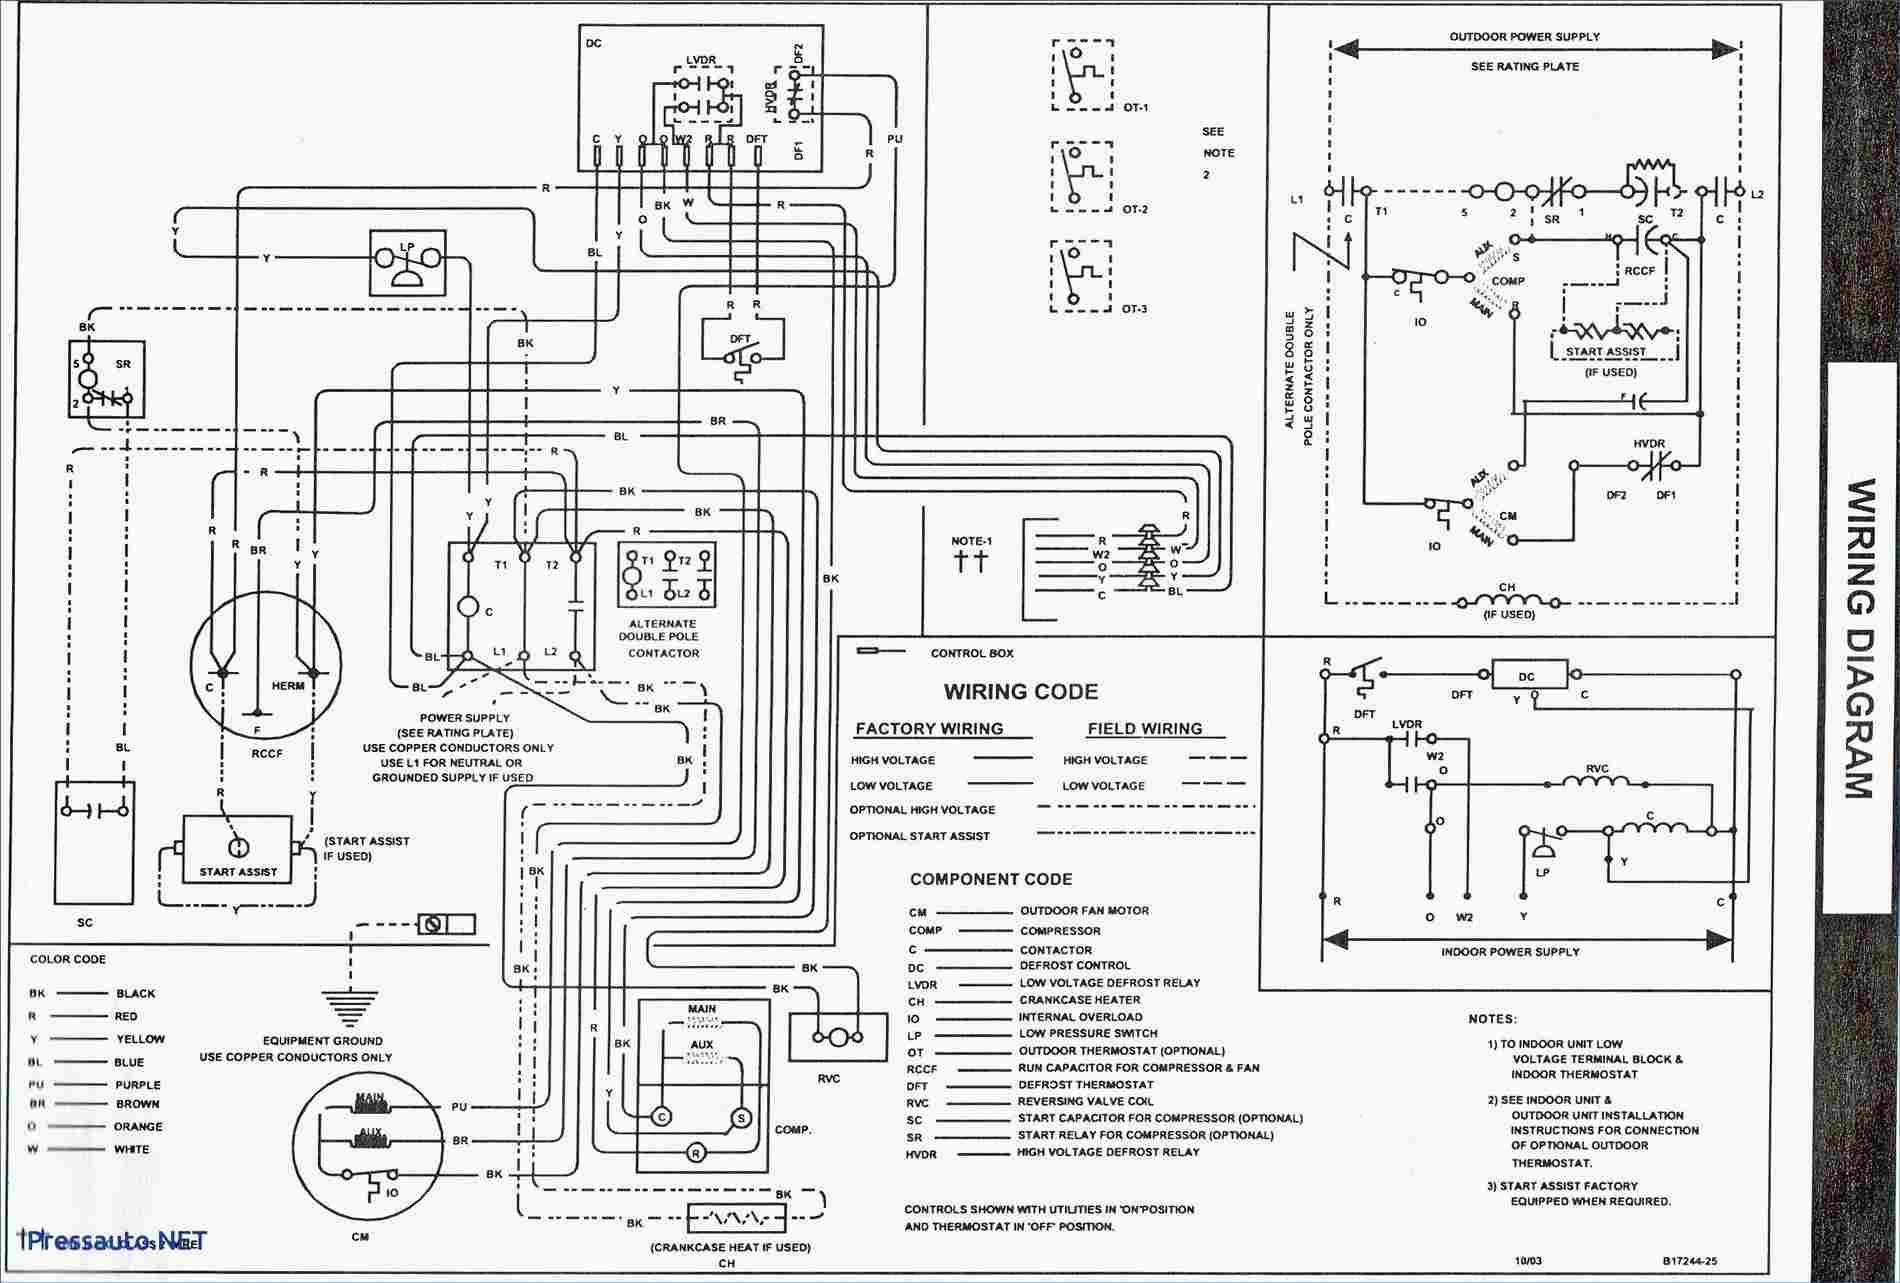 Goodman-Gmp-075-3-Furnace-Control-Board-Wiring-Diagram-Wire-Center-U - Electric Heat Wiring Diagram